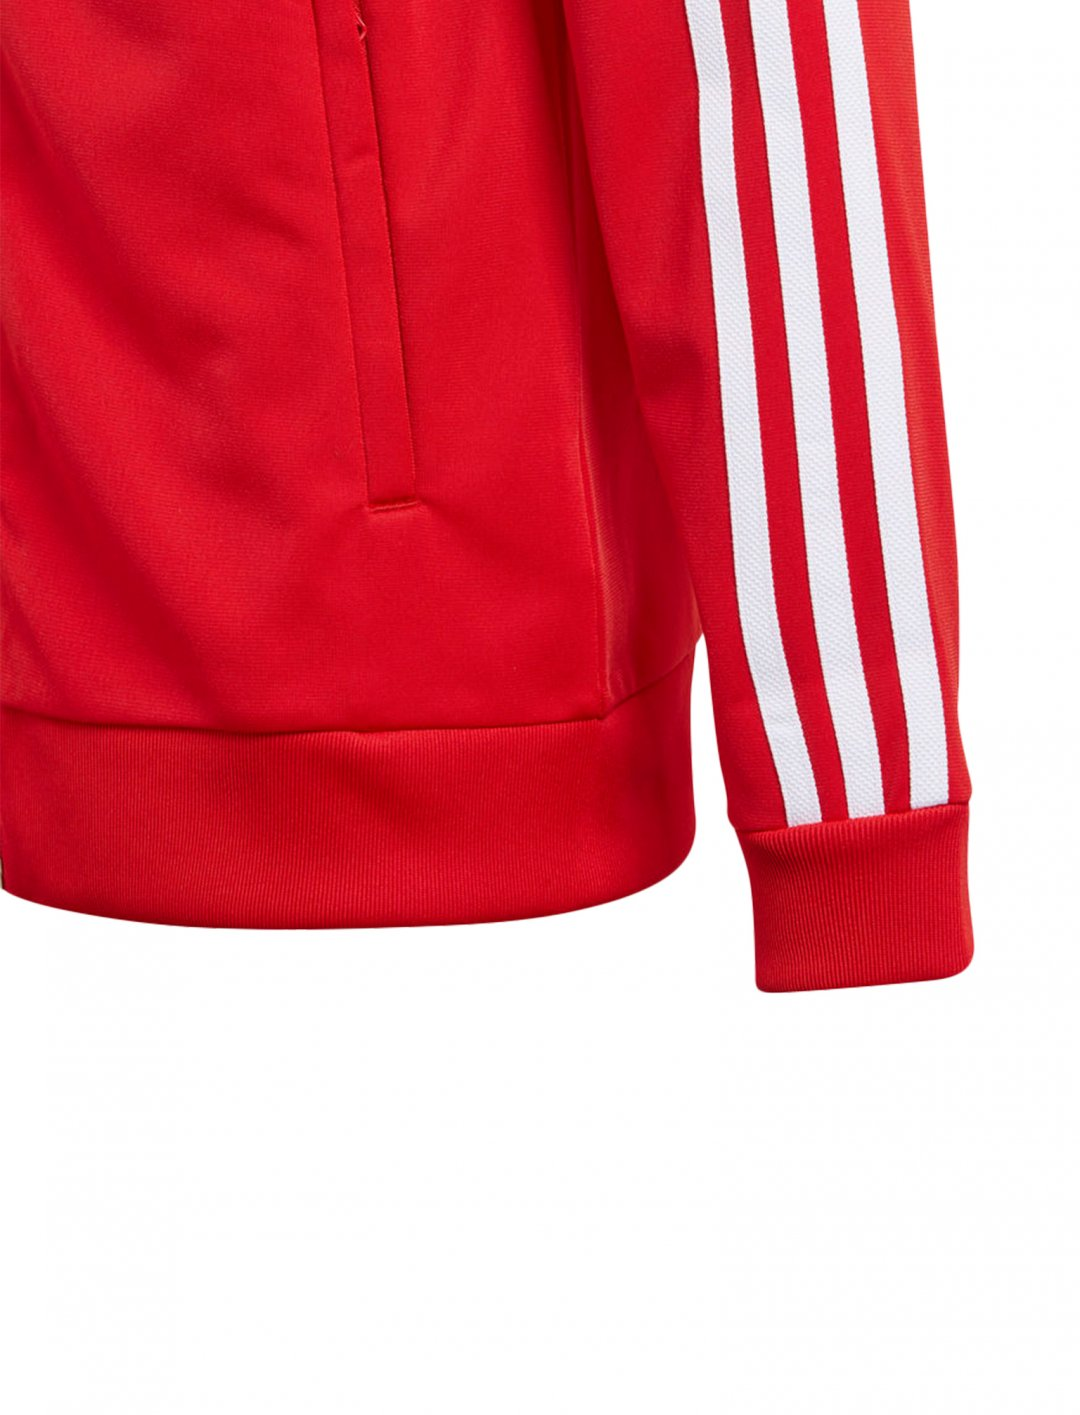 "Adidas Track Jacket {""id"":5,""product_section_id"":1,""name"":""Clothing"",""order"":5} Adidas"